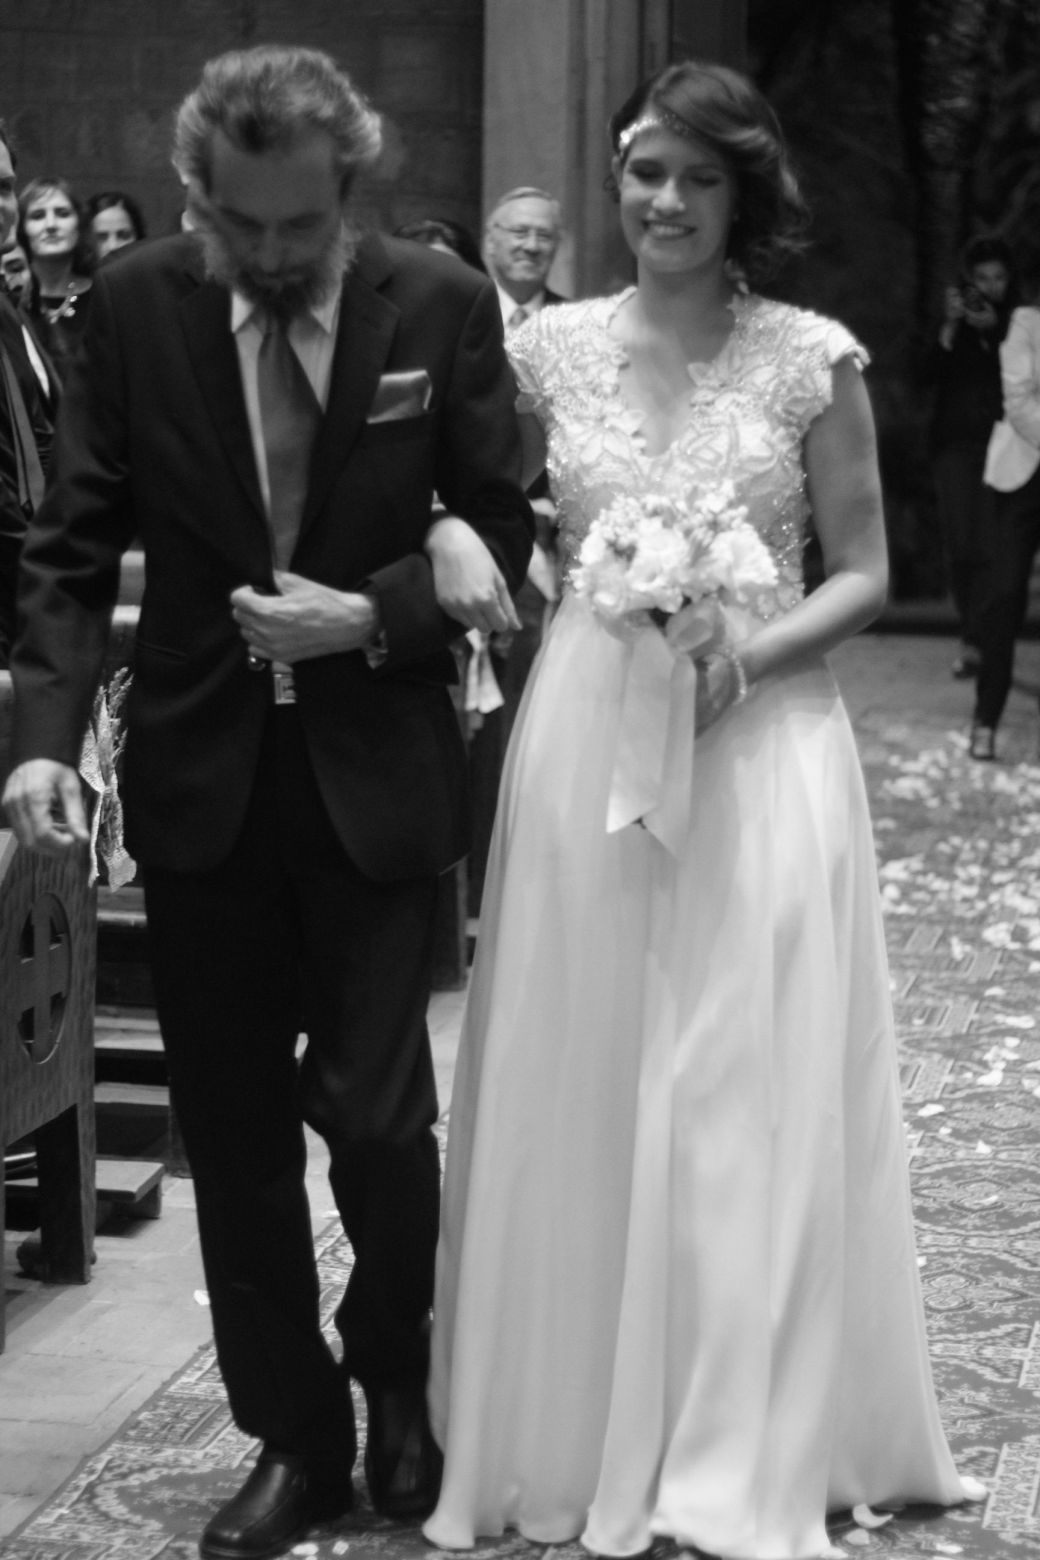 chile santiago san cristobal hill wedding 12